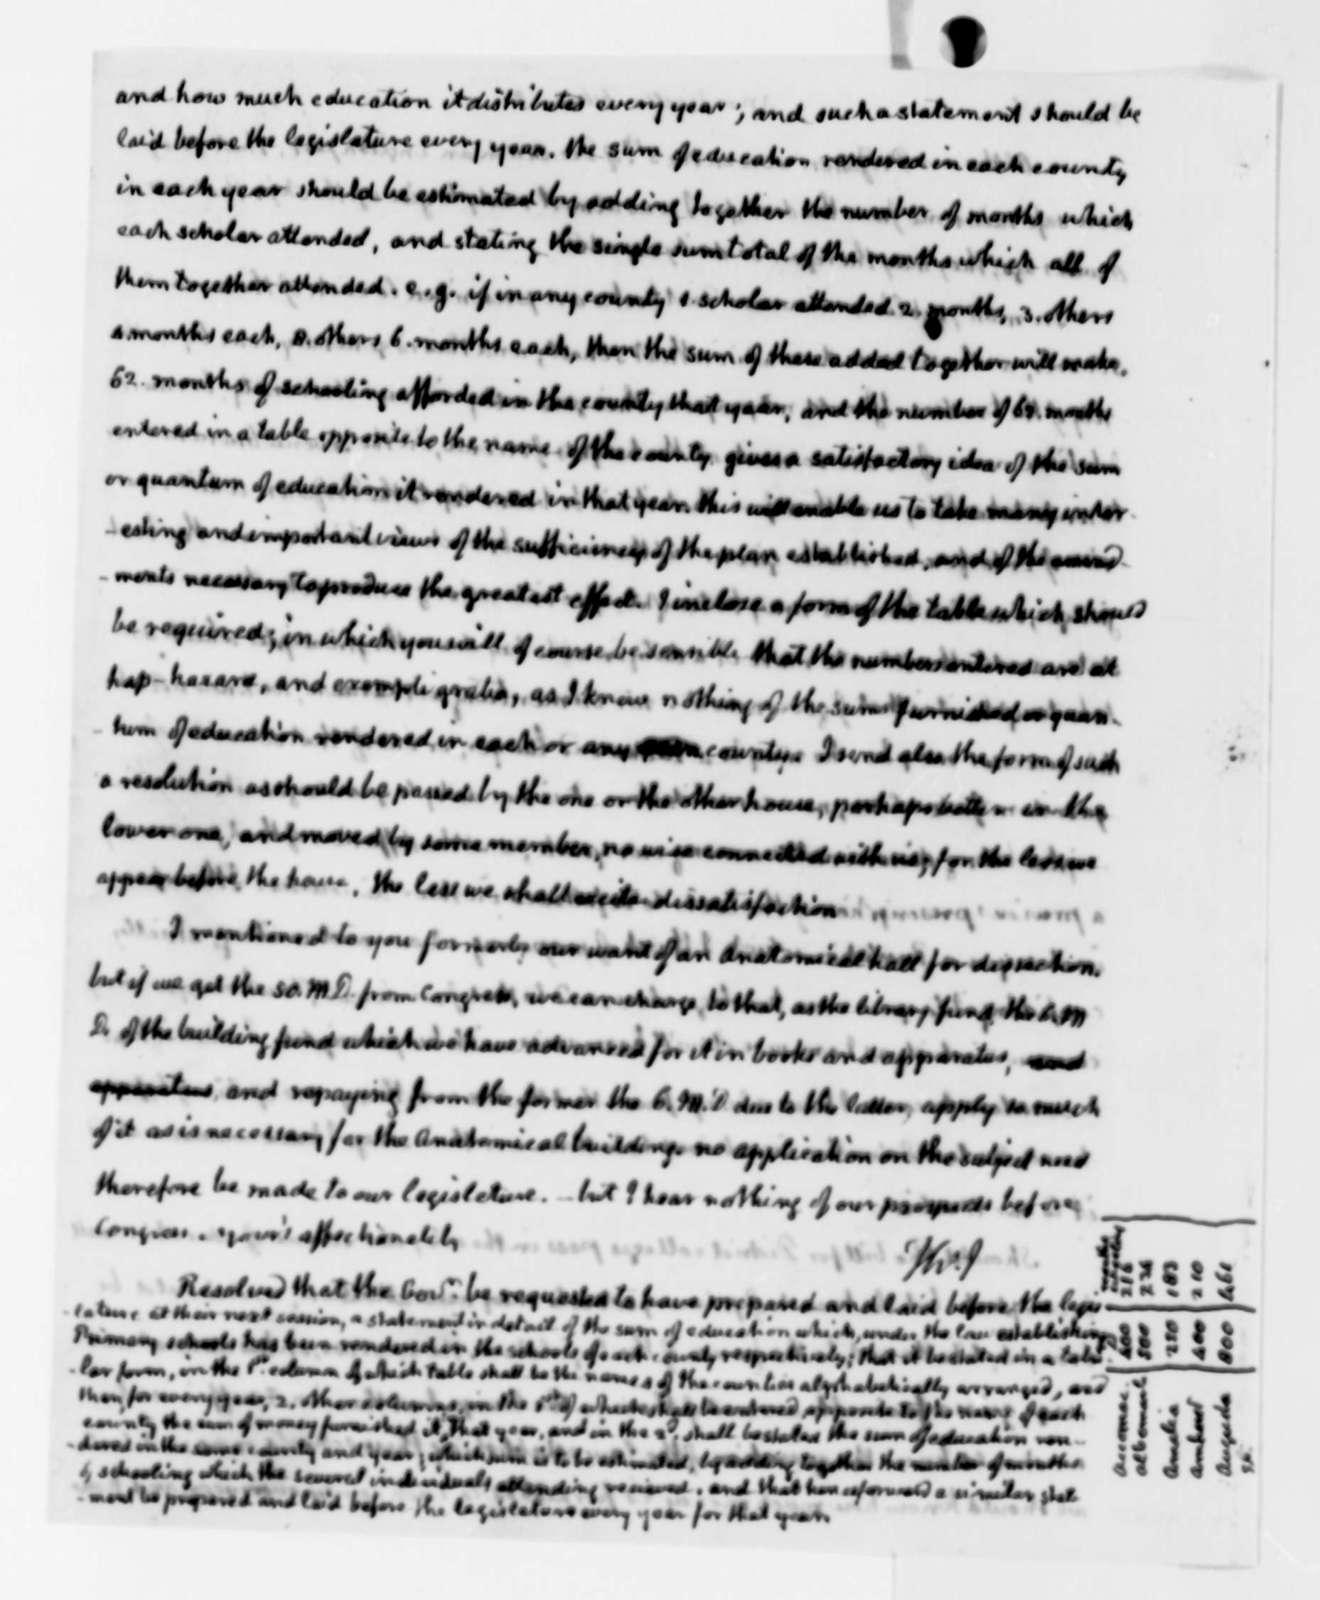 Thomas Jefferson to Joseph C. Cabell, February 3, 1825